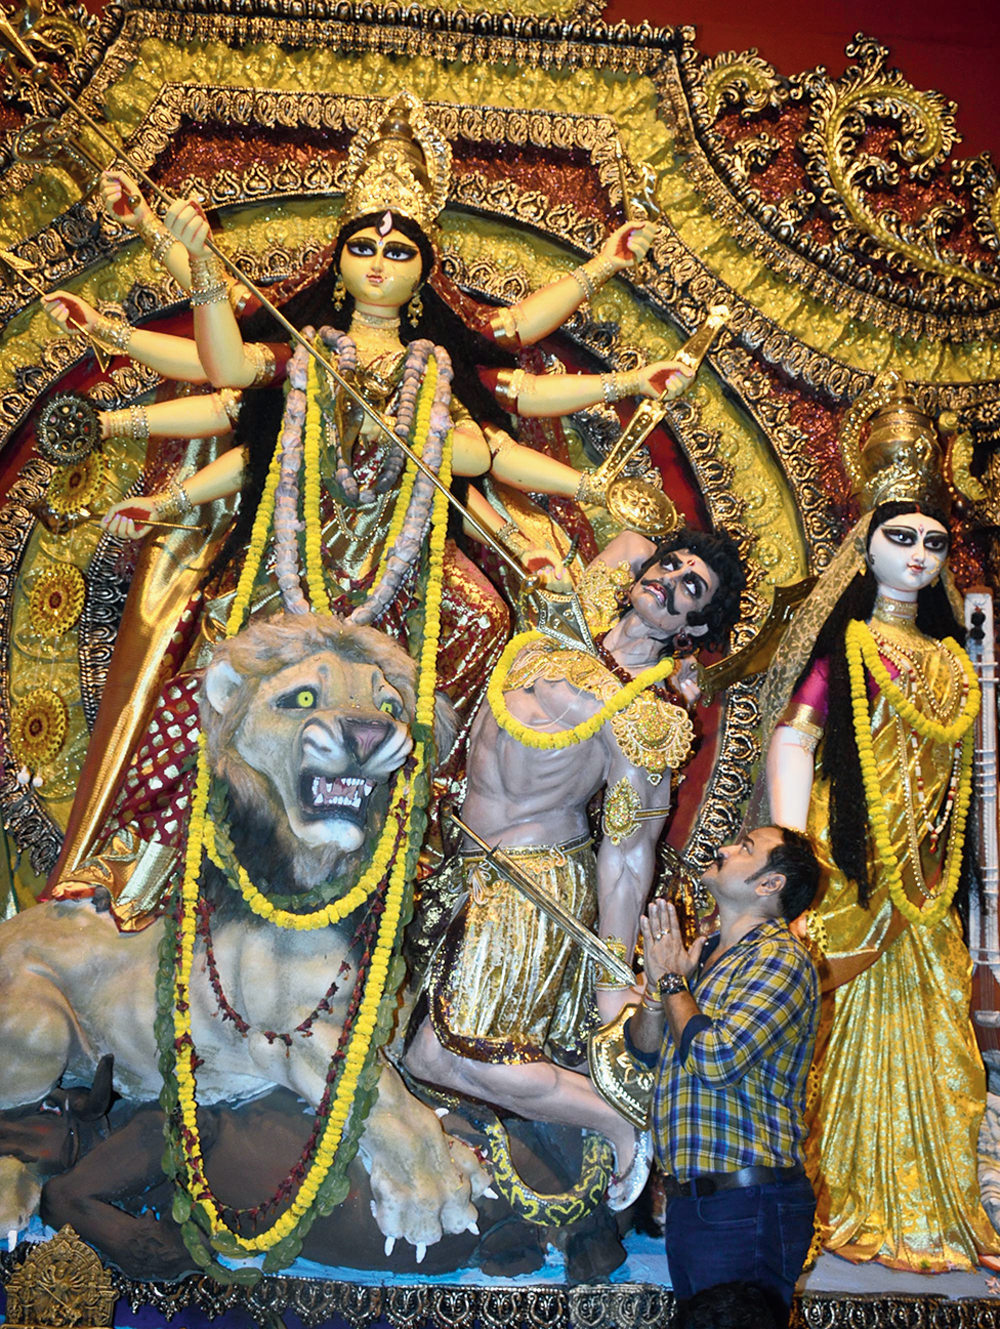 Pradip Rudrapal in front of the BJ Block goddess